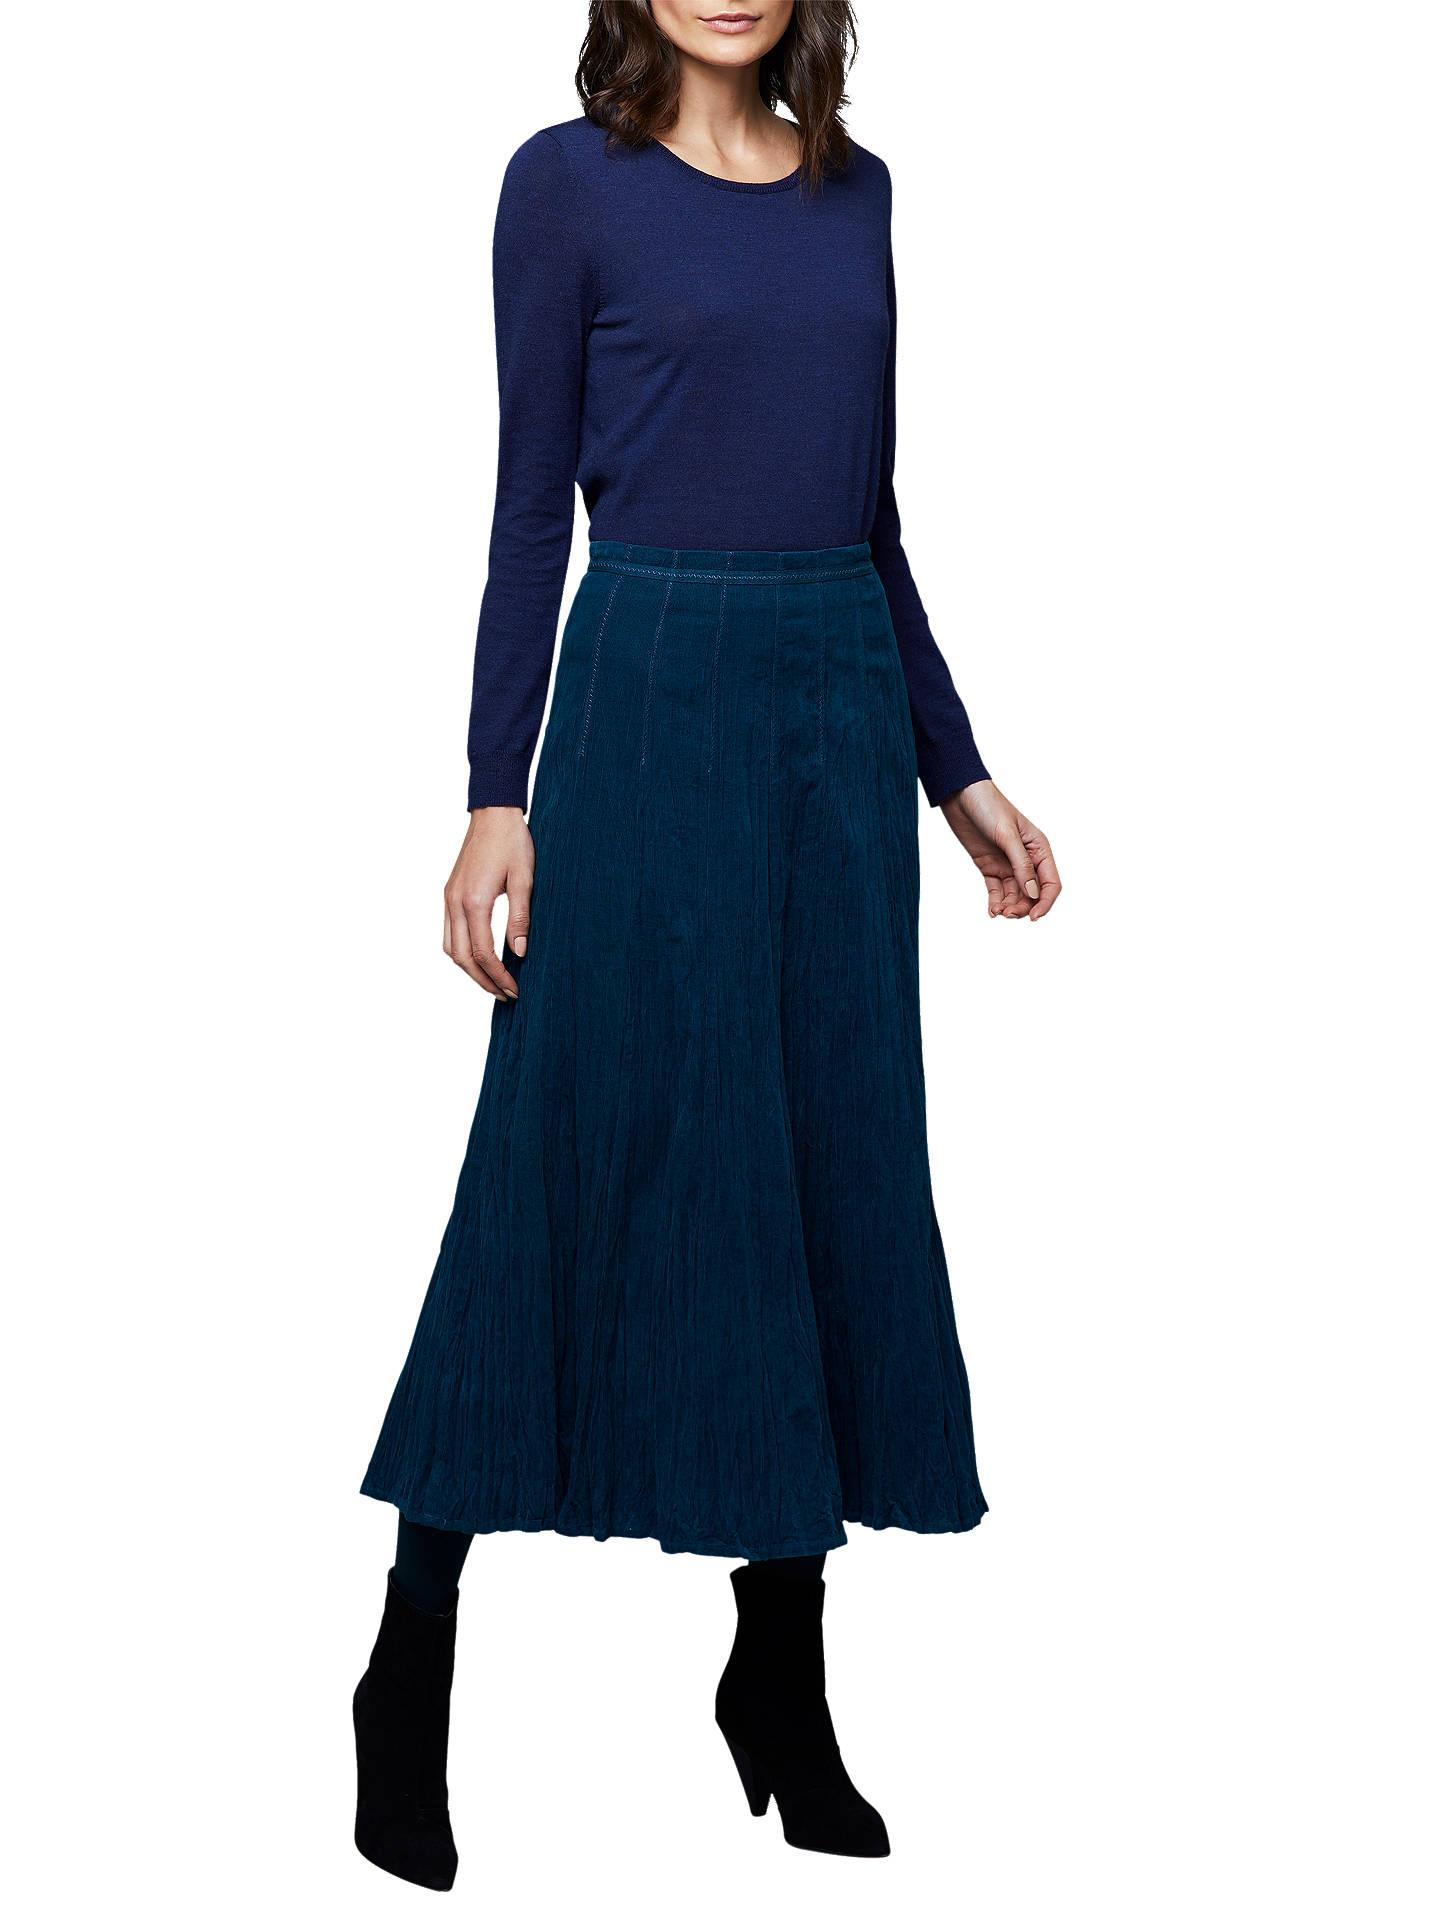 Inspiration: Fashion duffy the disney bear, How to high wear waisted black pants